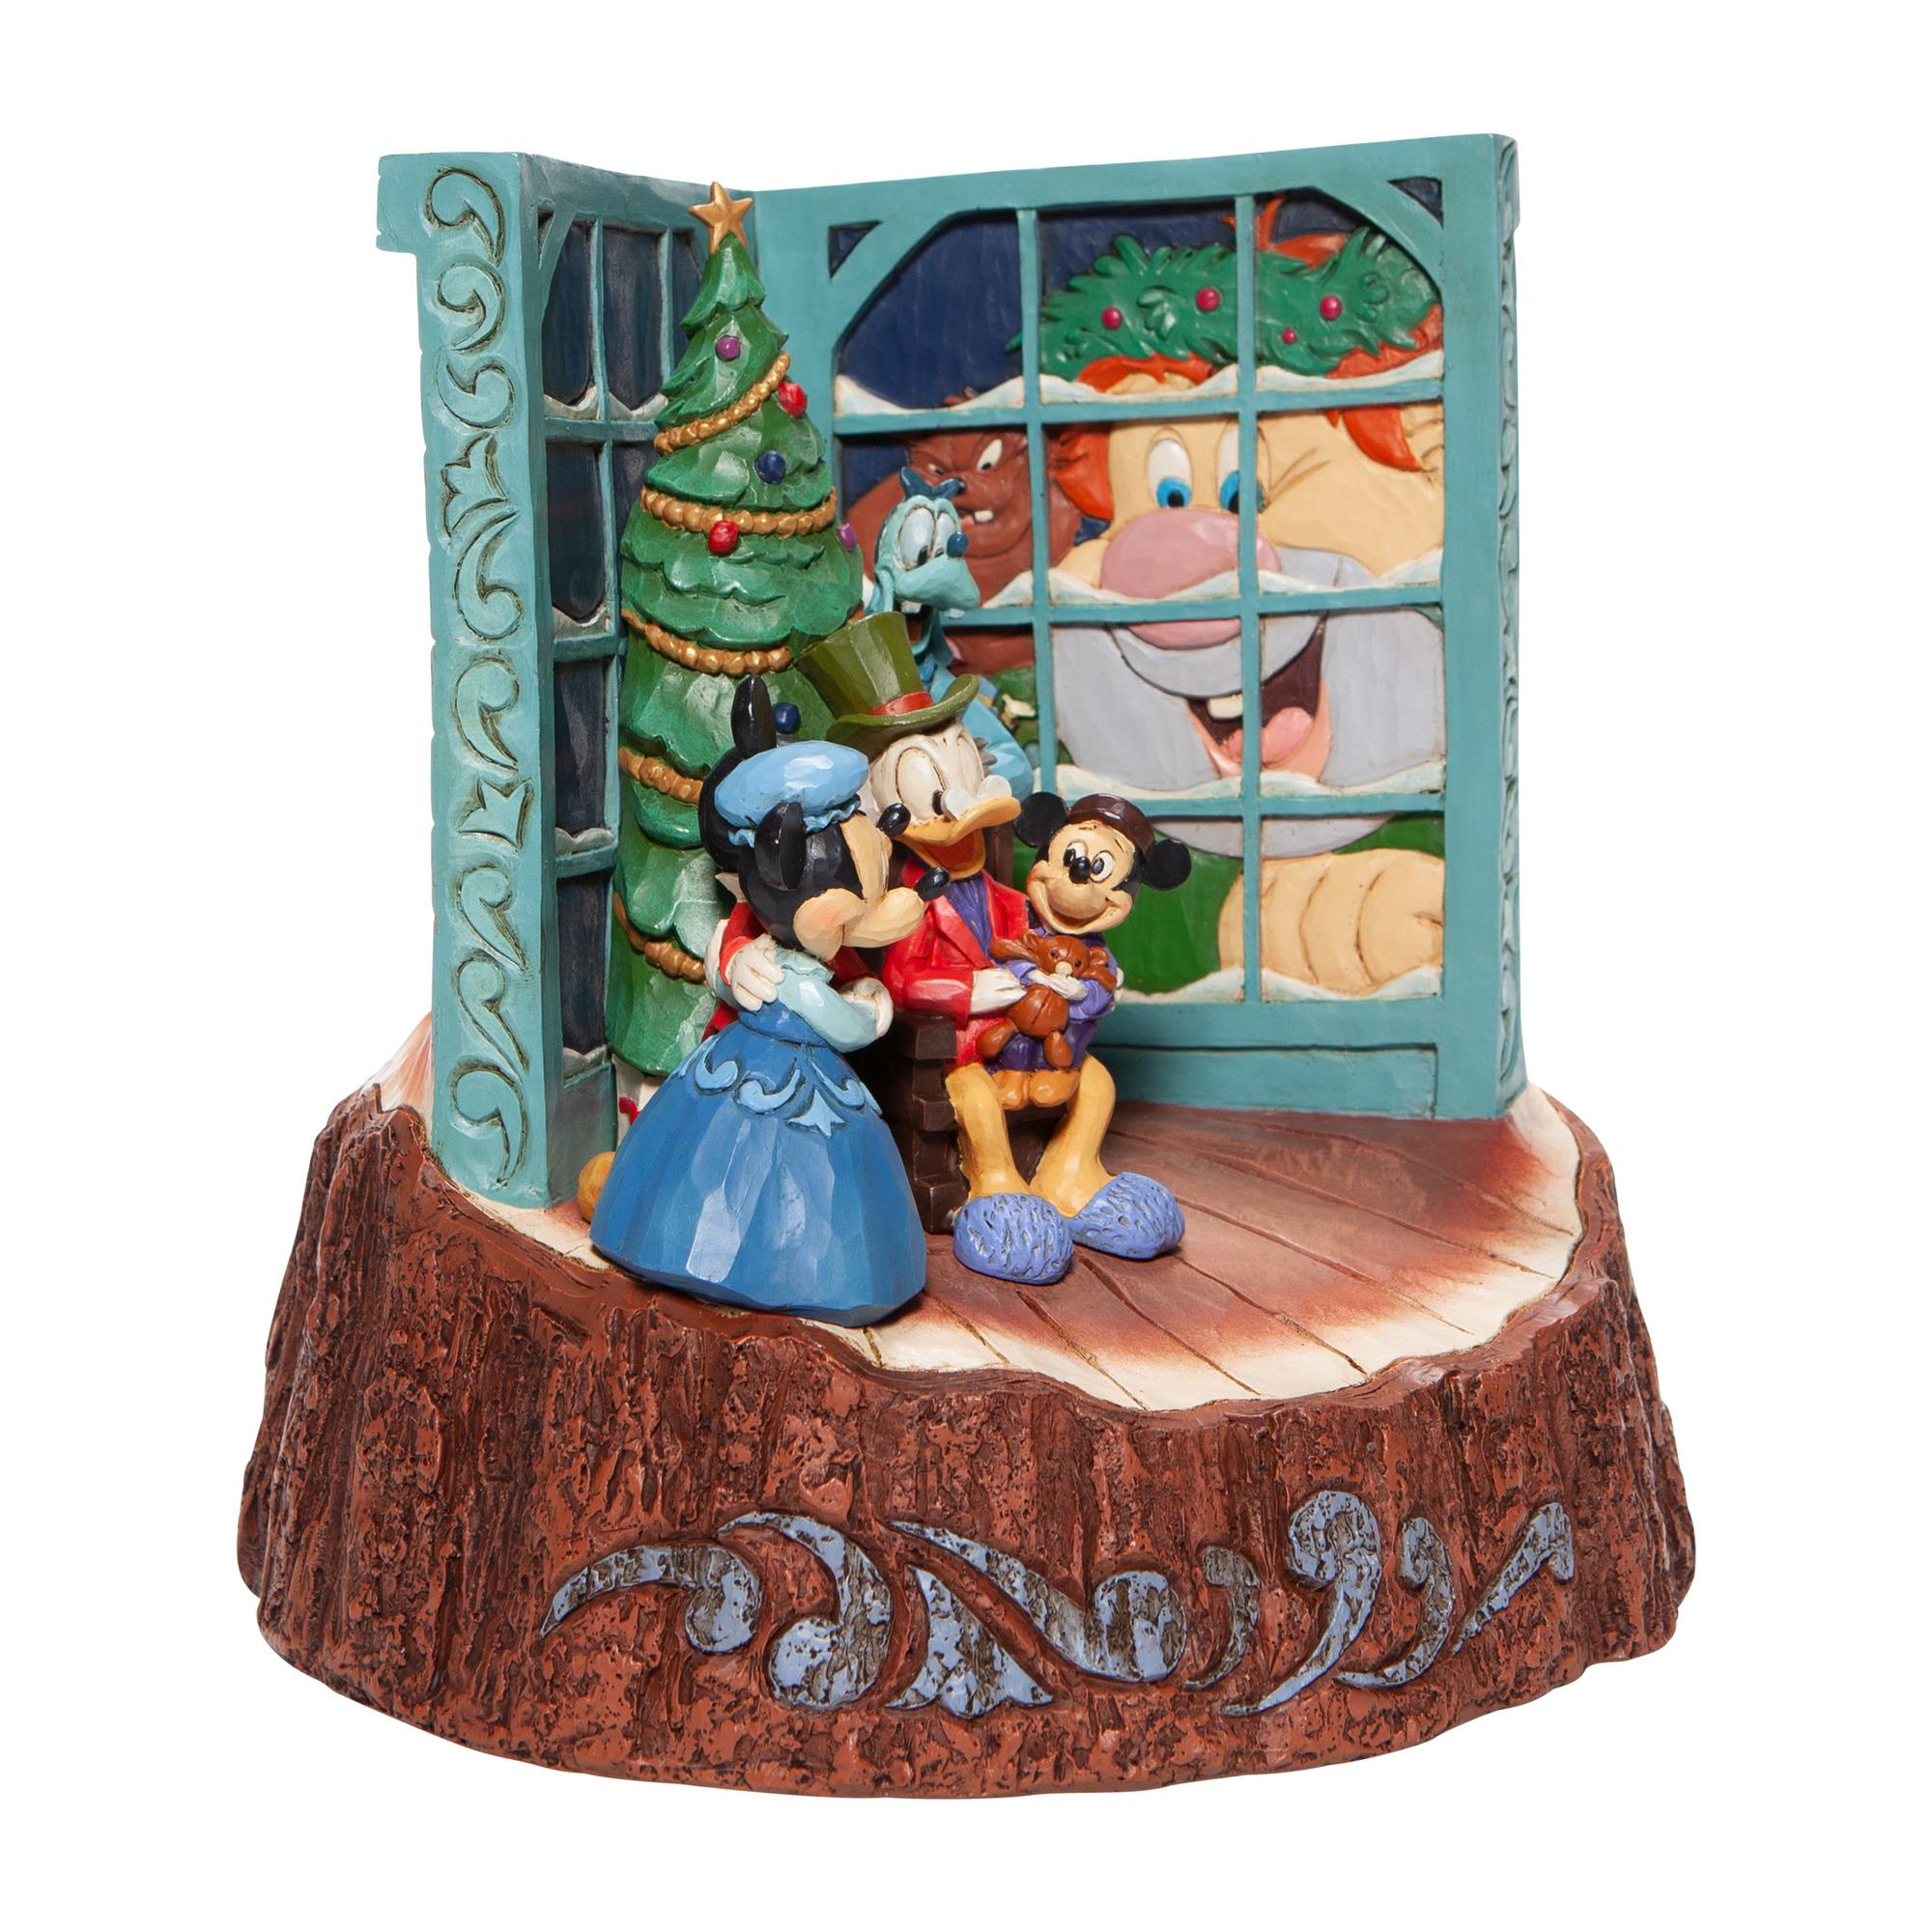 "Mickey's Christmas Carol ""God Bless Us, Everyone!"" – Disney Traditions by Jim Shore (6007060) at ..."